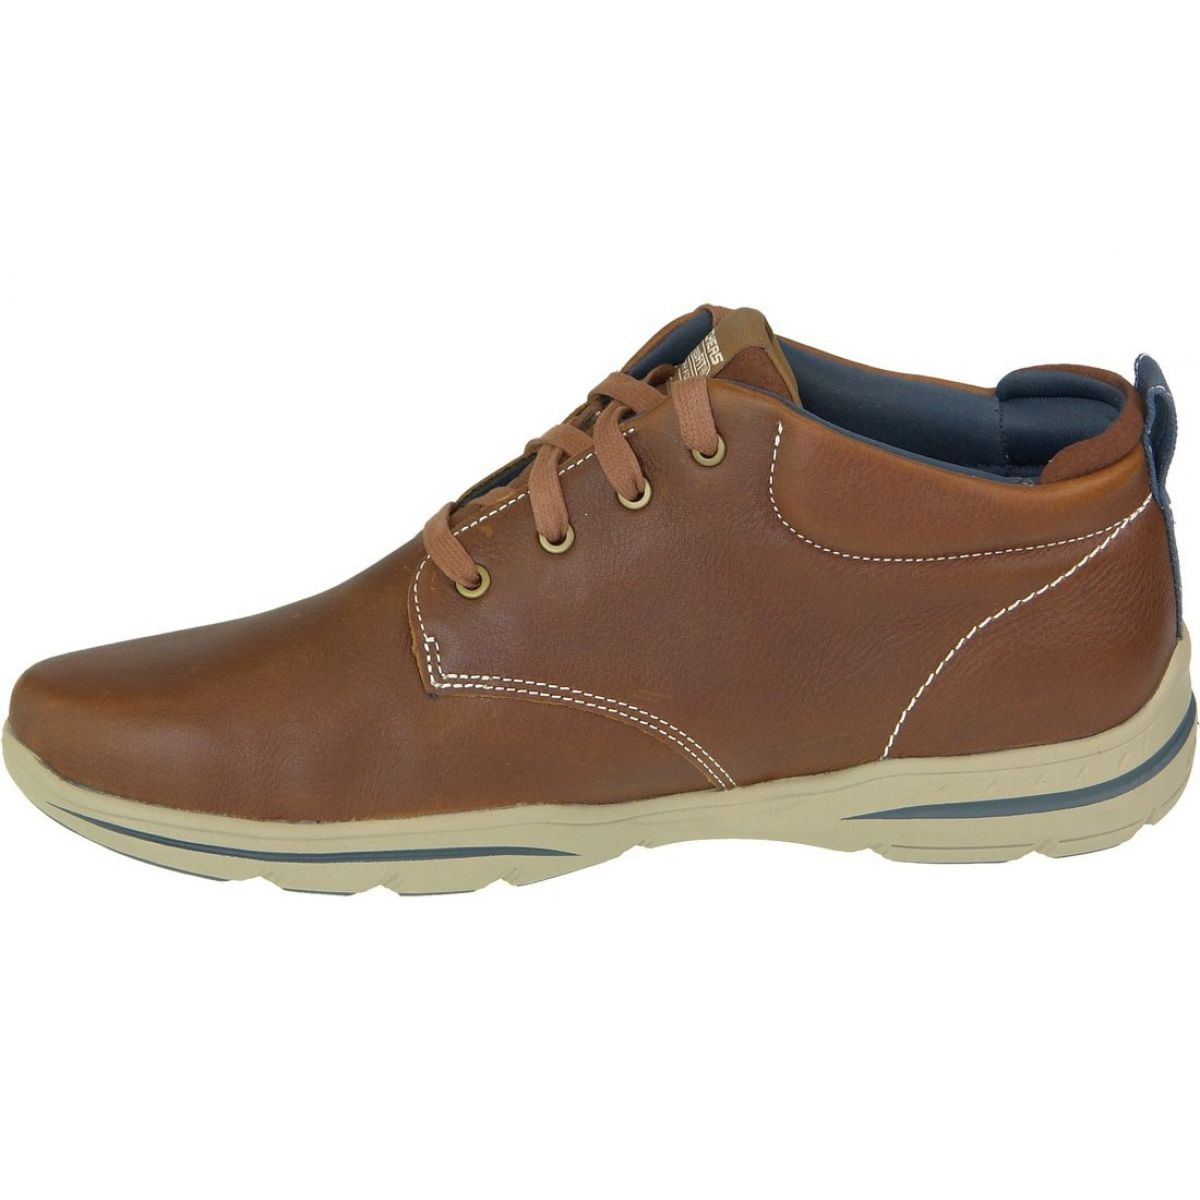 Limitado Agnes Gray Montaña  Skechers Harper Melden M 64857-LUG shoes brown | eBay